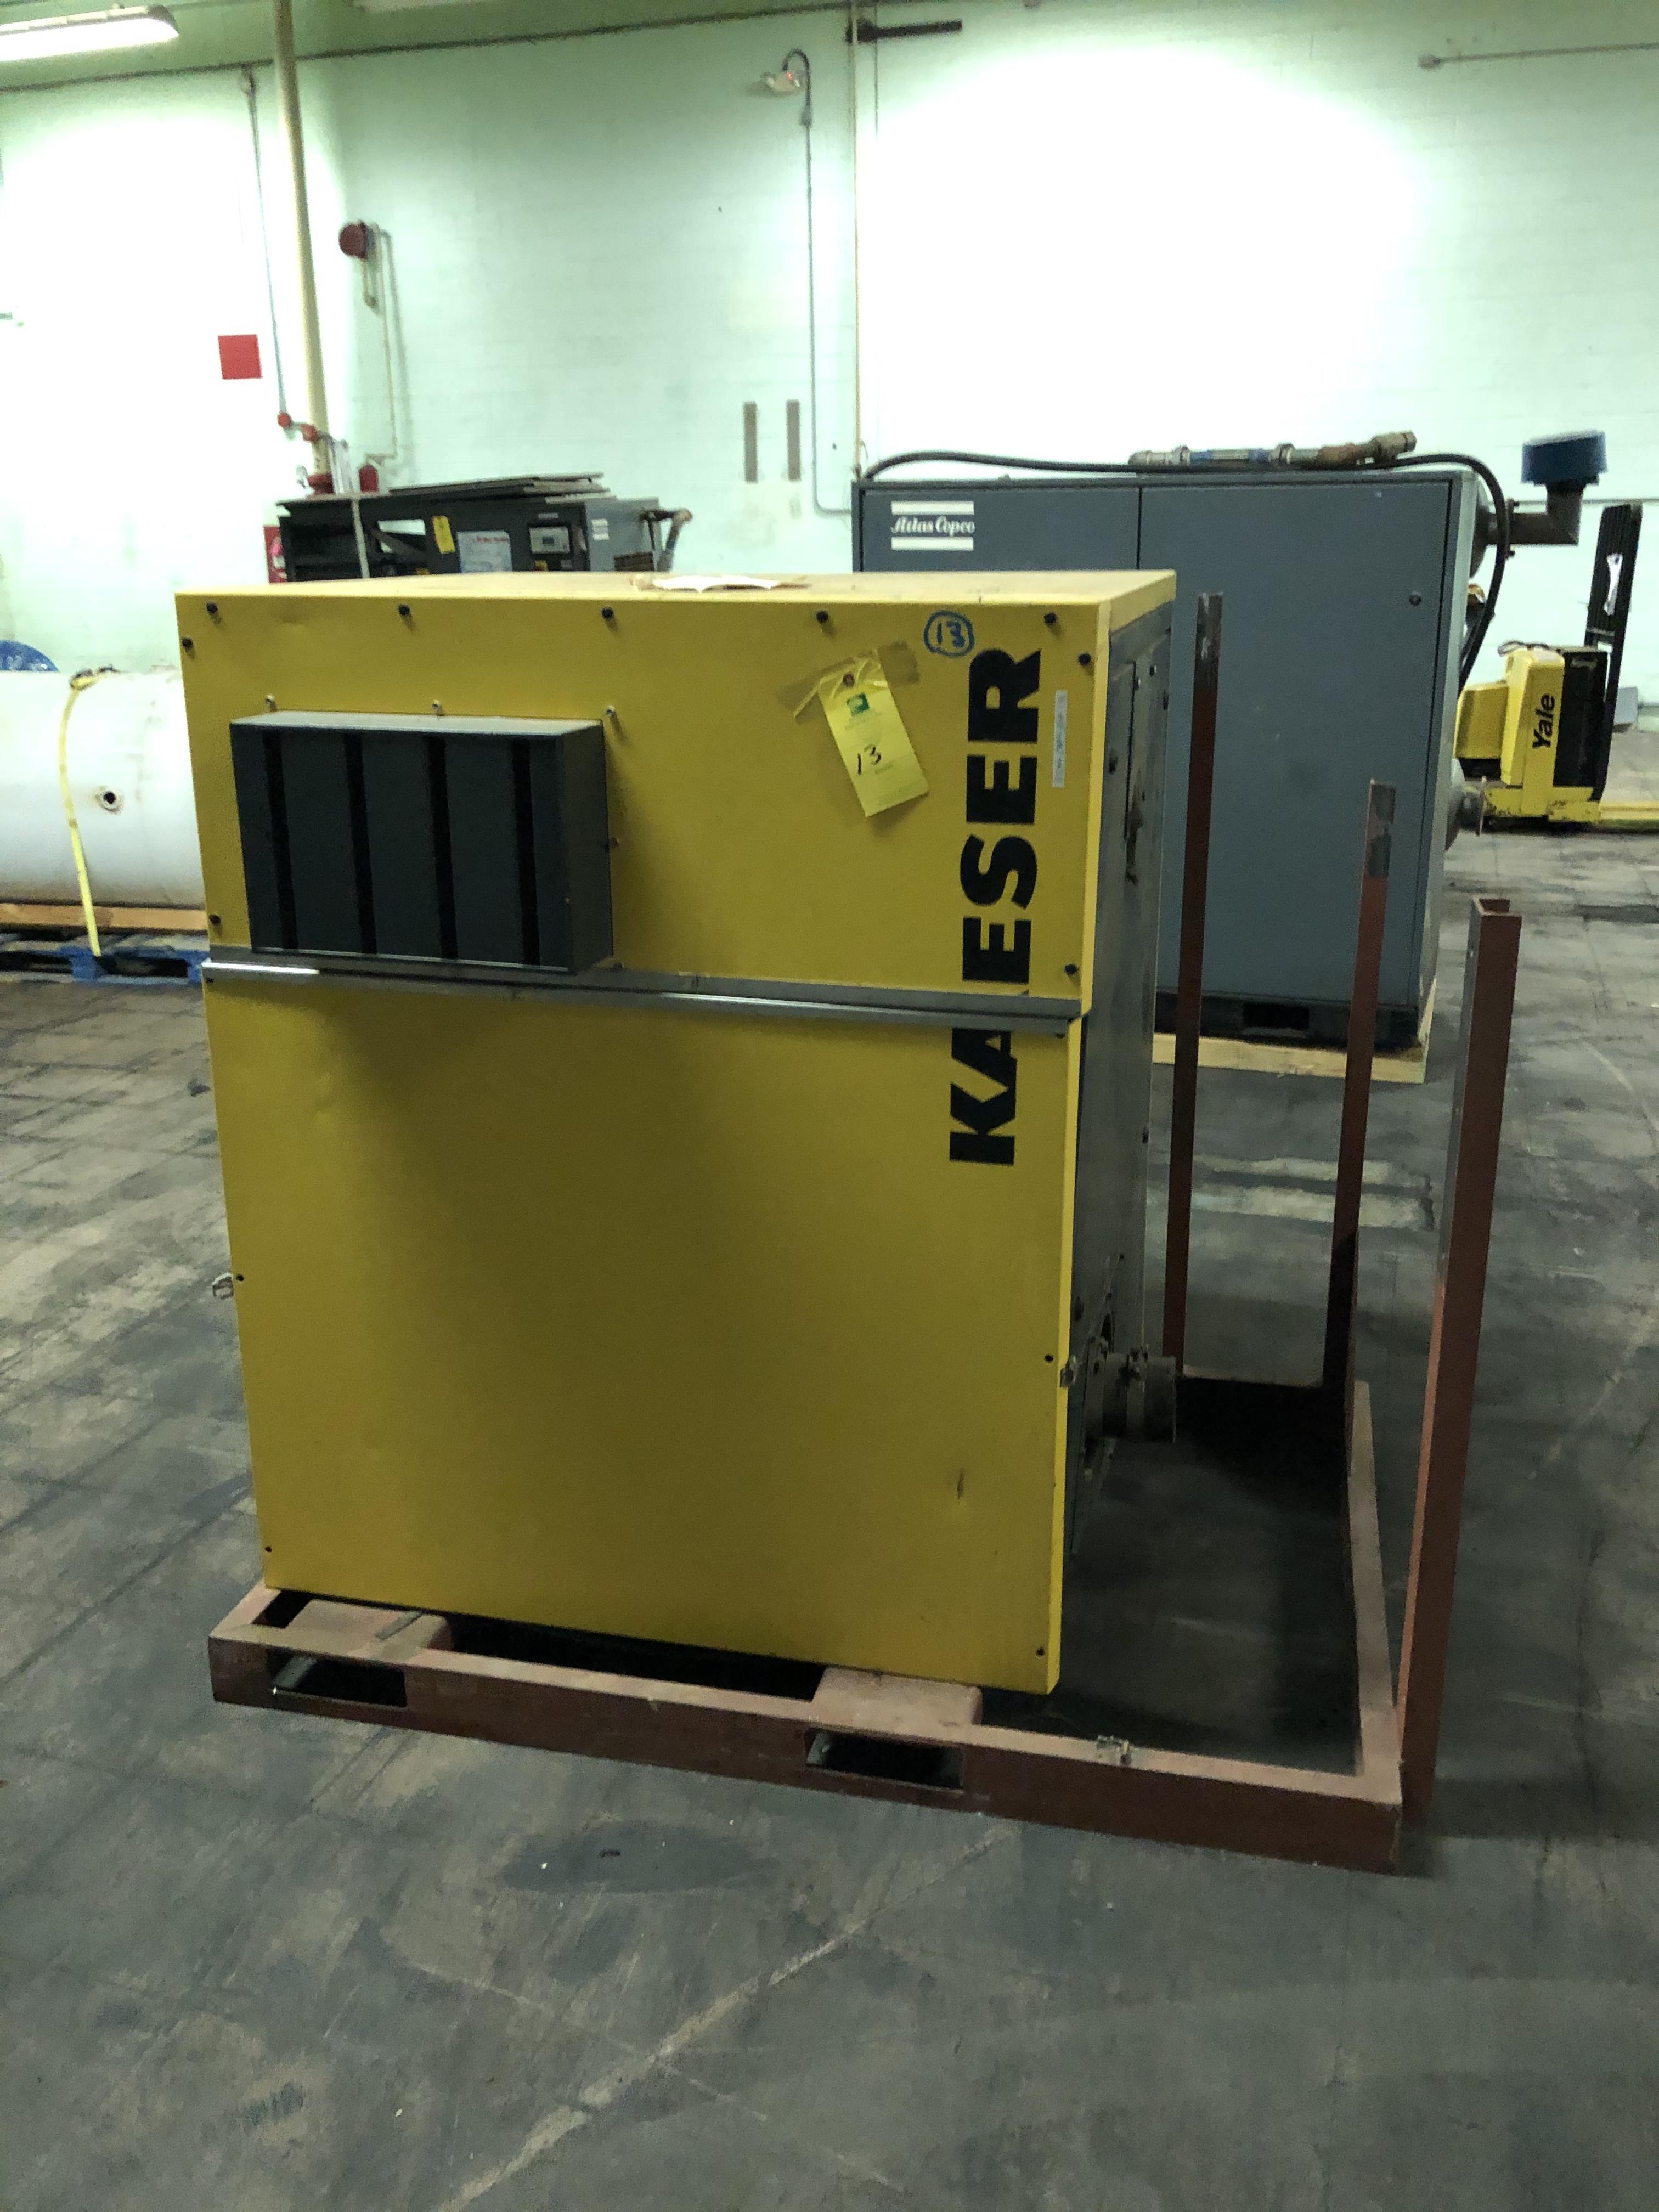 Kaeser Model #AS-44 Air Compressor, Hours N/A, RIGGING FEE - $150